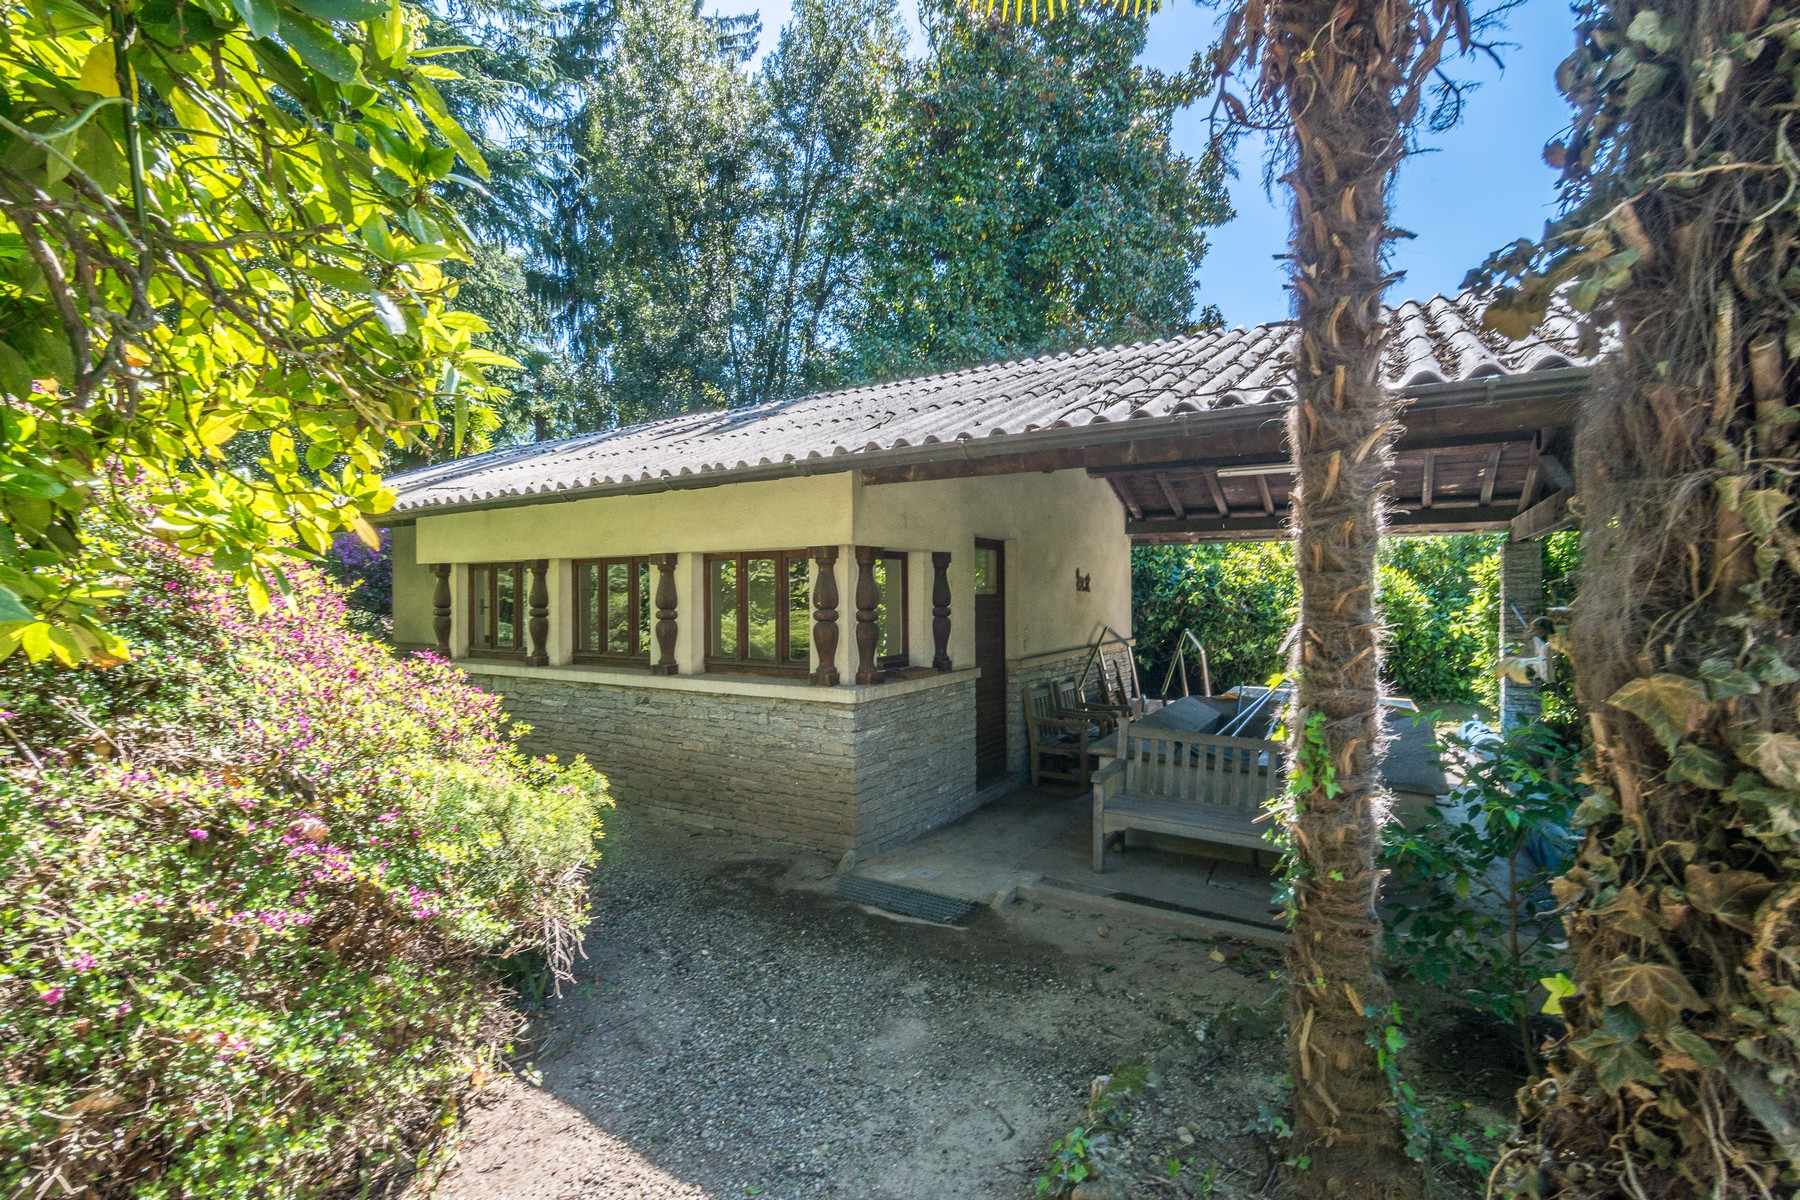 Villa in Vendita a Varese: 5 locali, 1500 mq - Foto 12